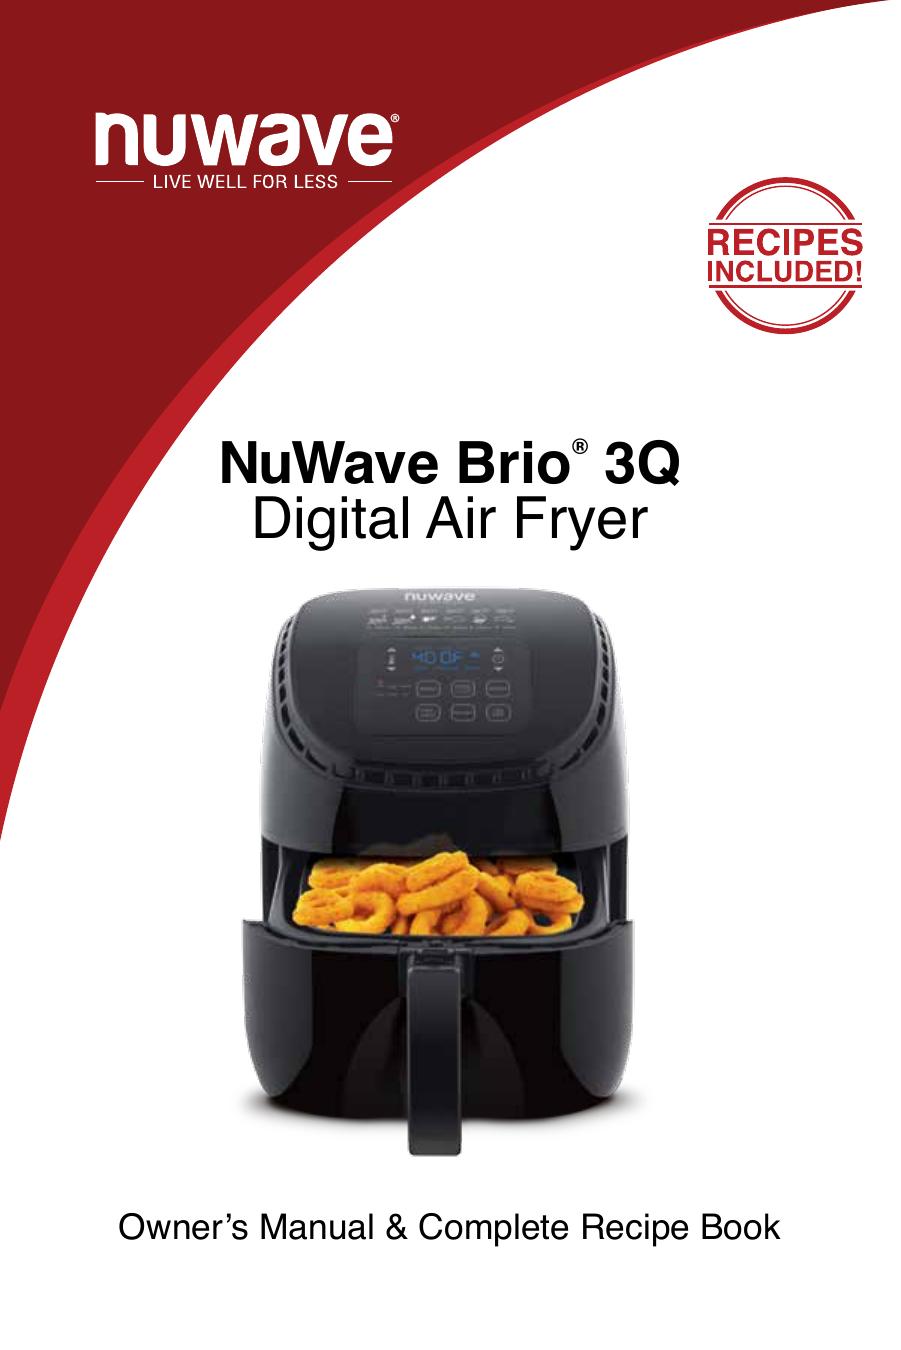 Nuwave Nuwave Brio 3q 36011 Owner S Manual Manualzz